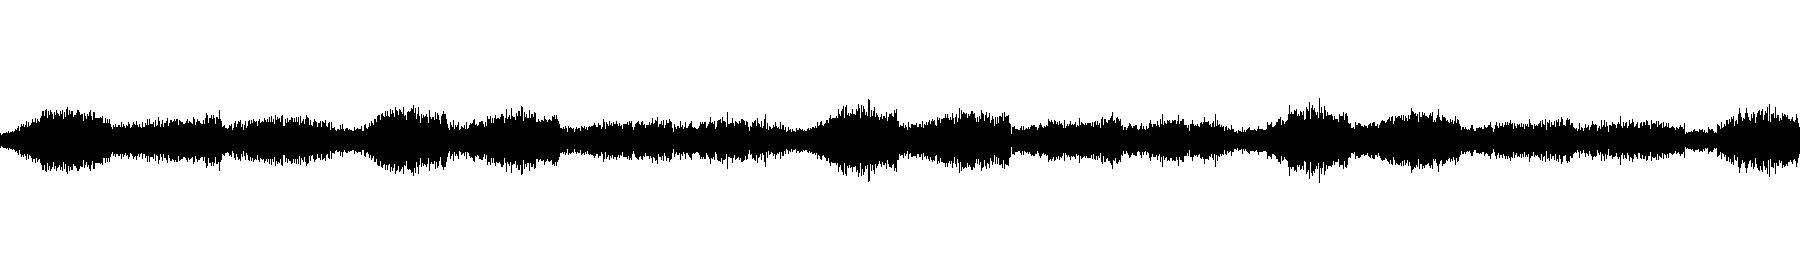 pth synth 19